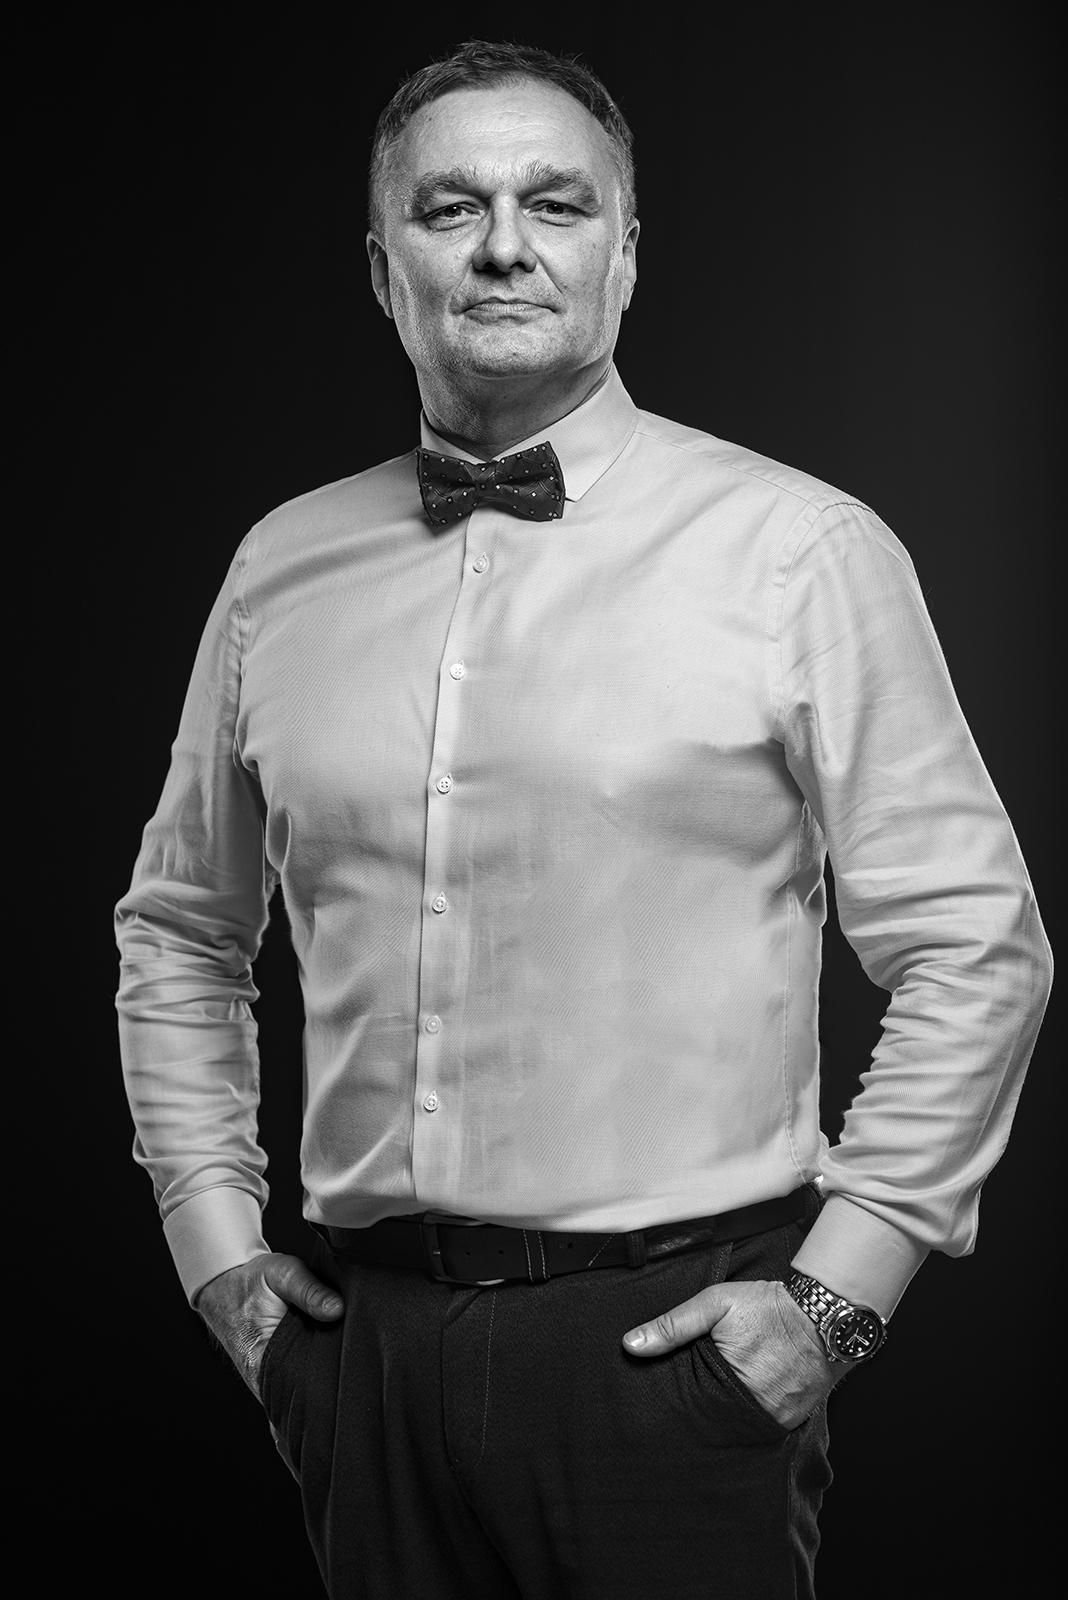 Jacek Stefaniuk